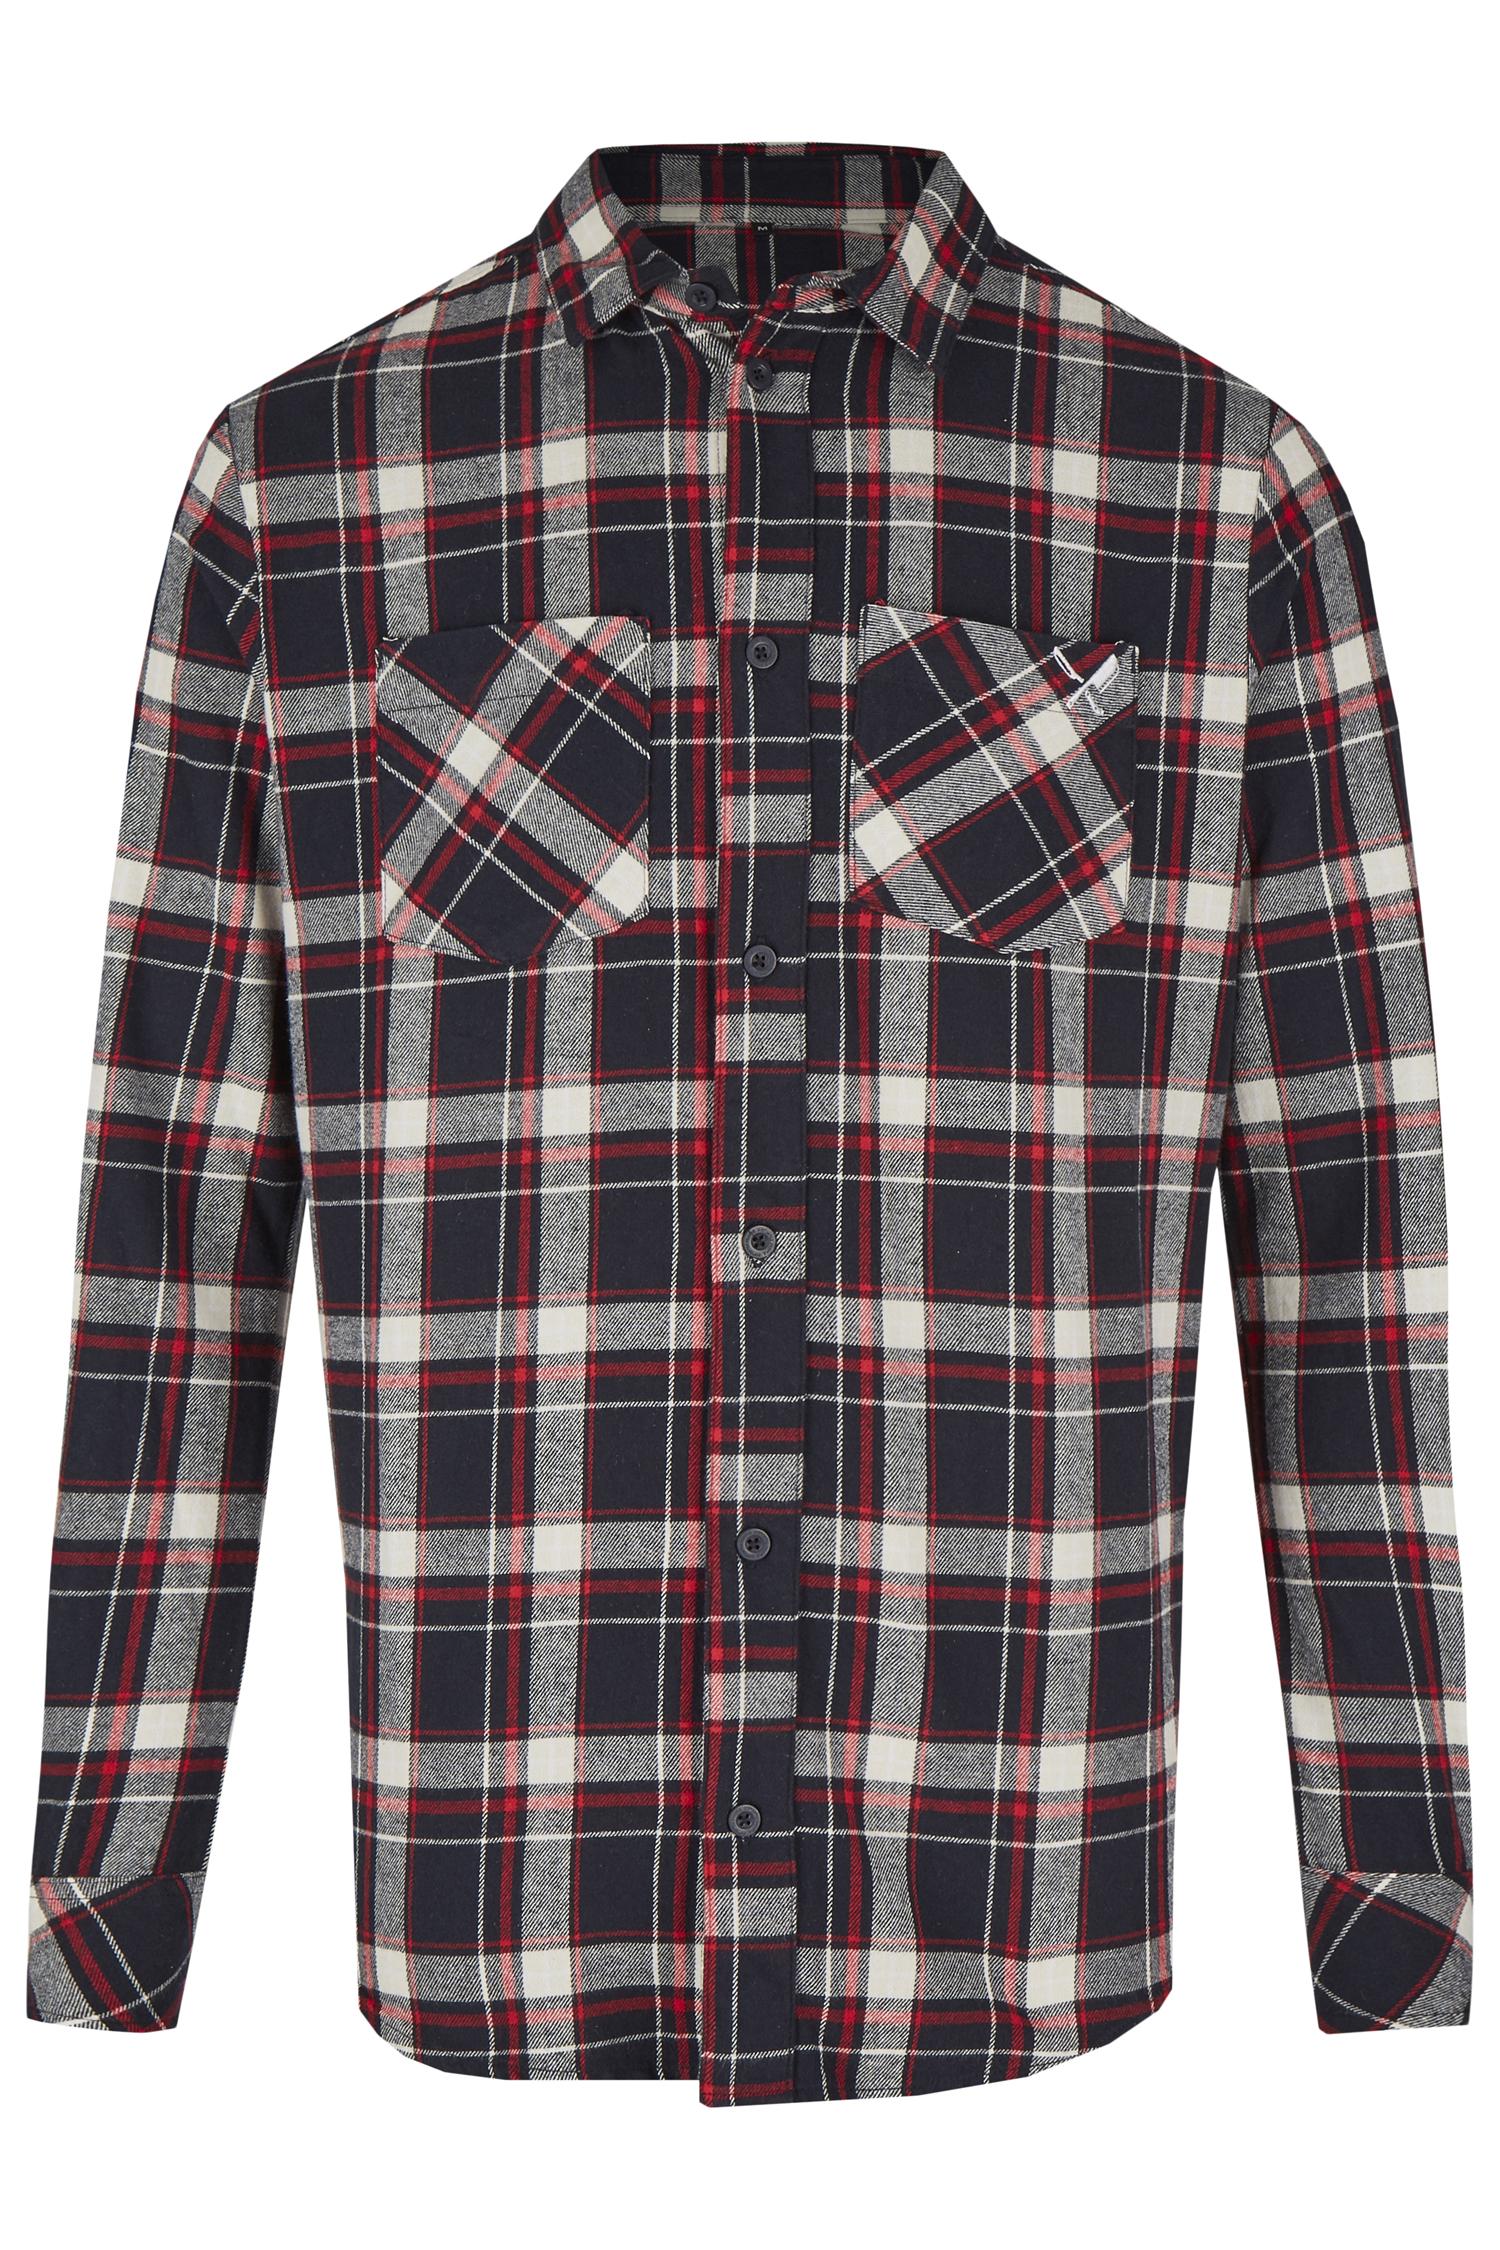 Trachtenhemd Distorted People Flannel S | navy